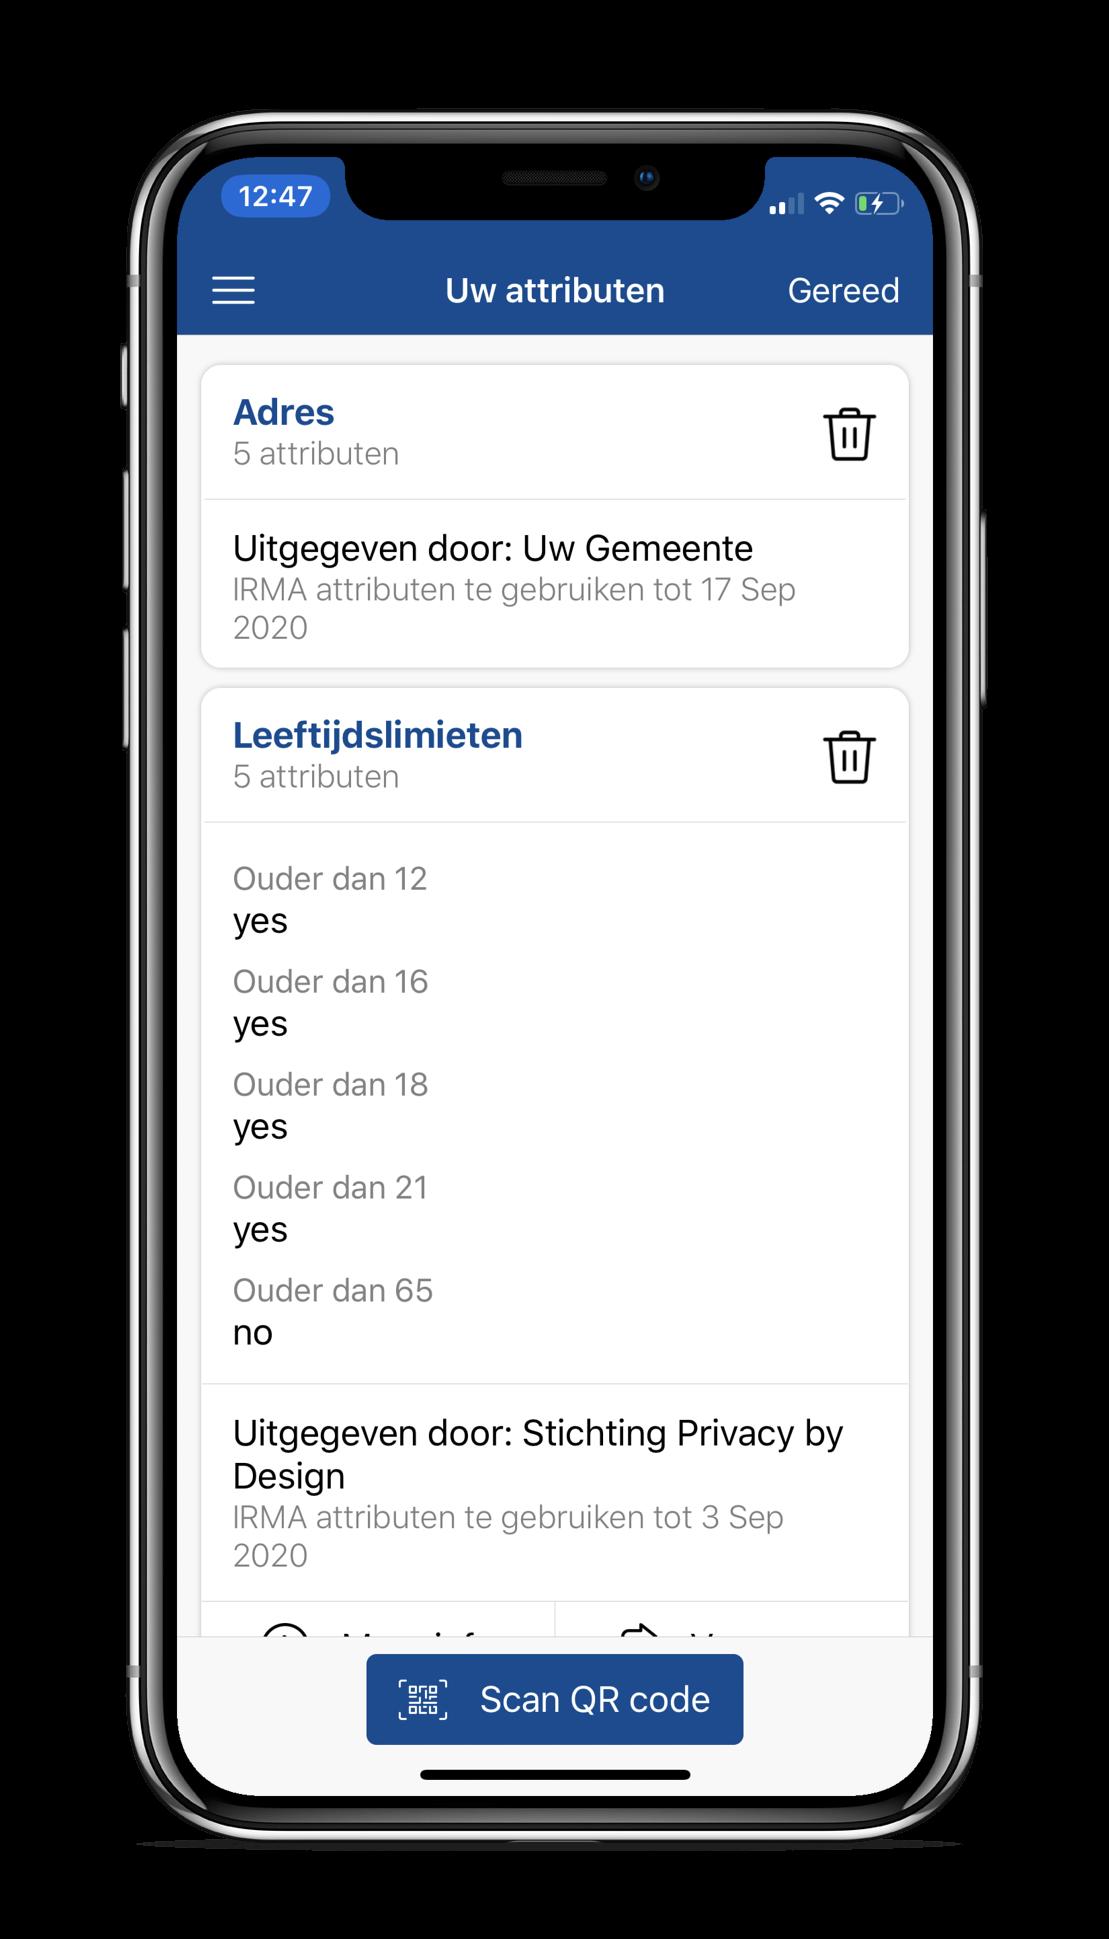 uploads/non-free/screenshot-nl.png